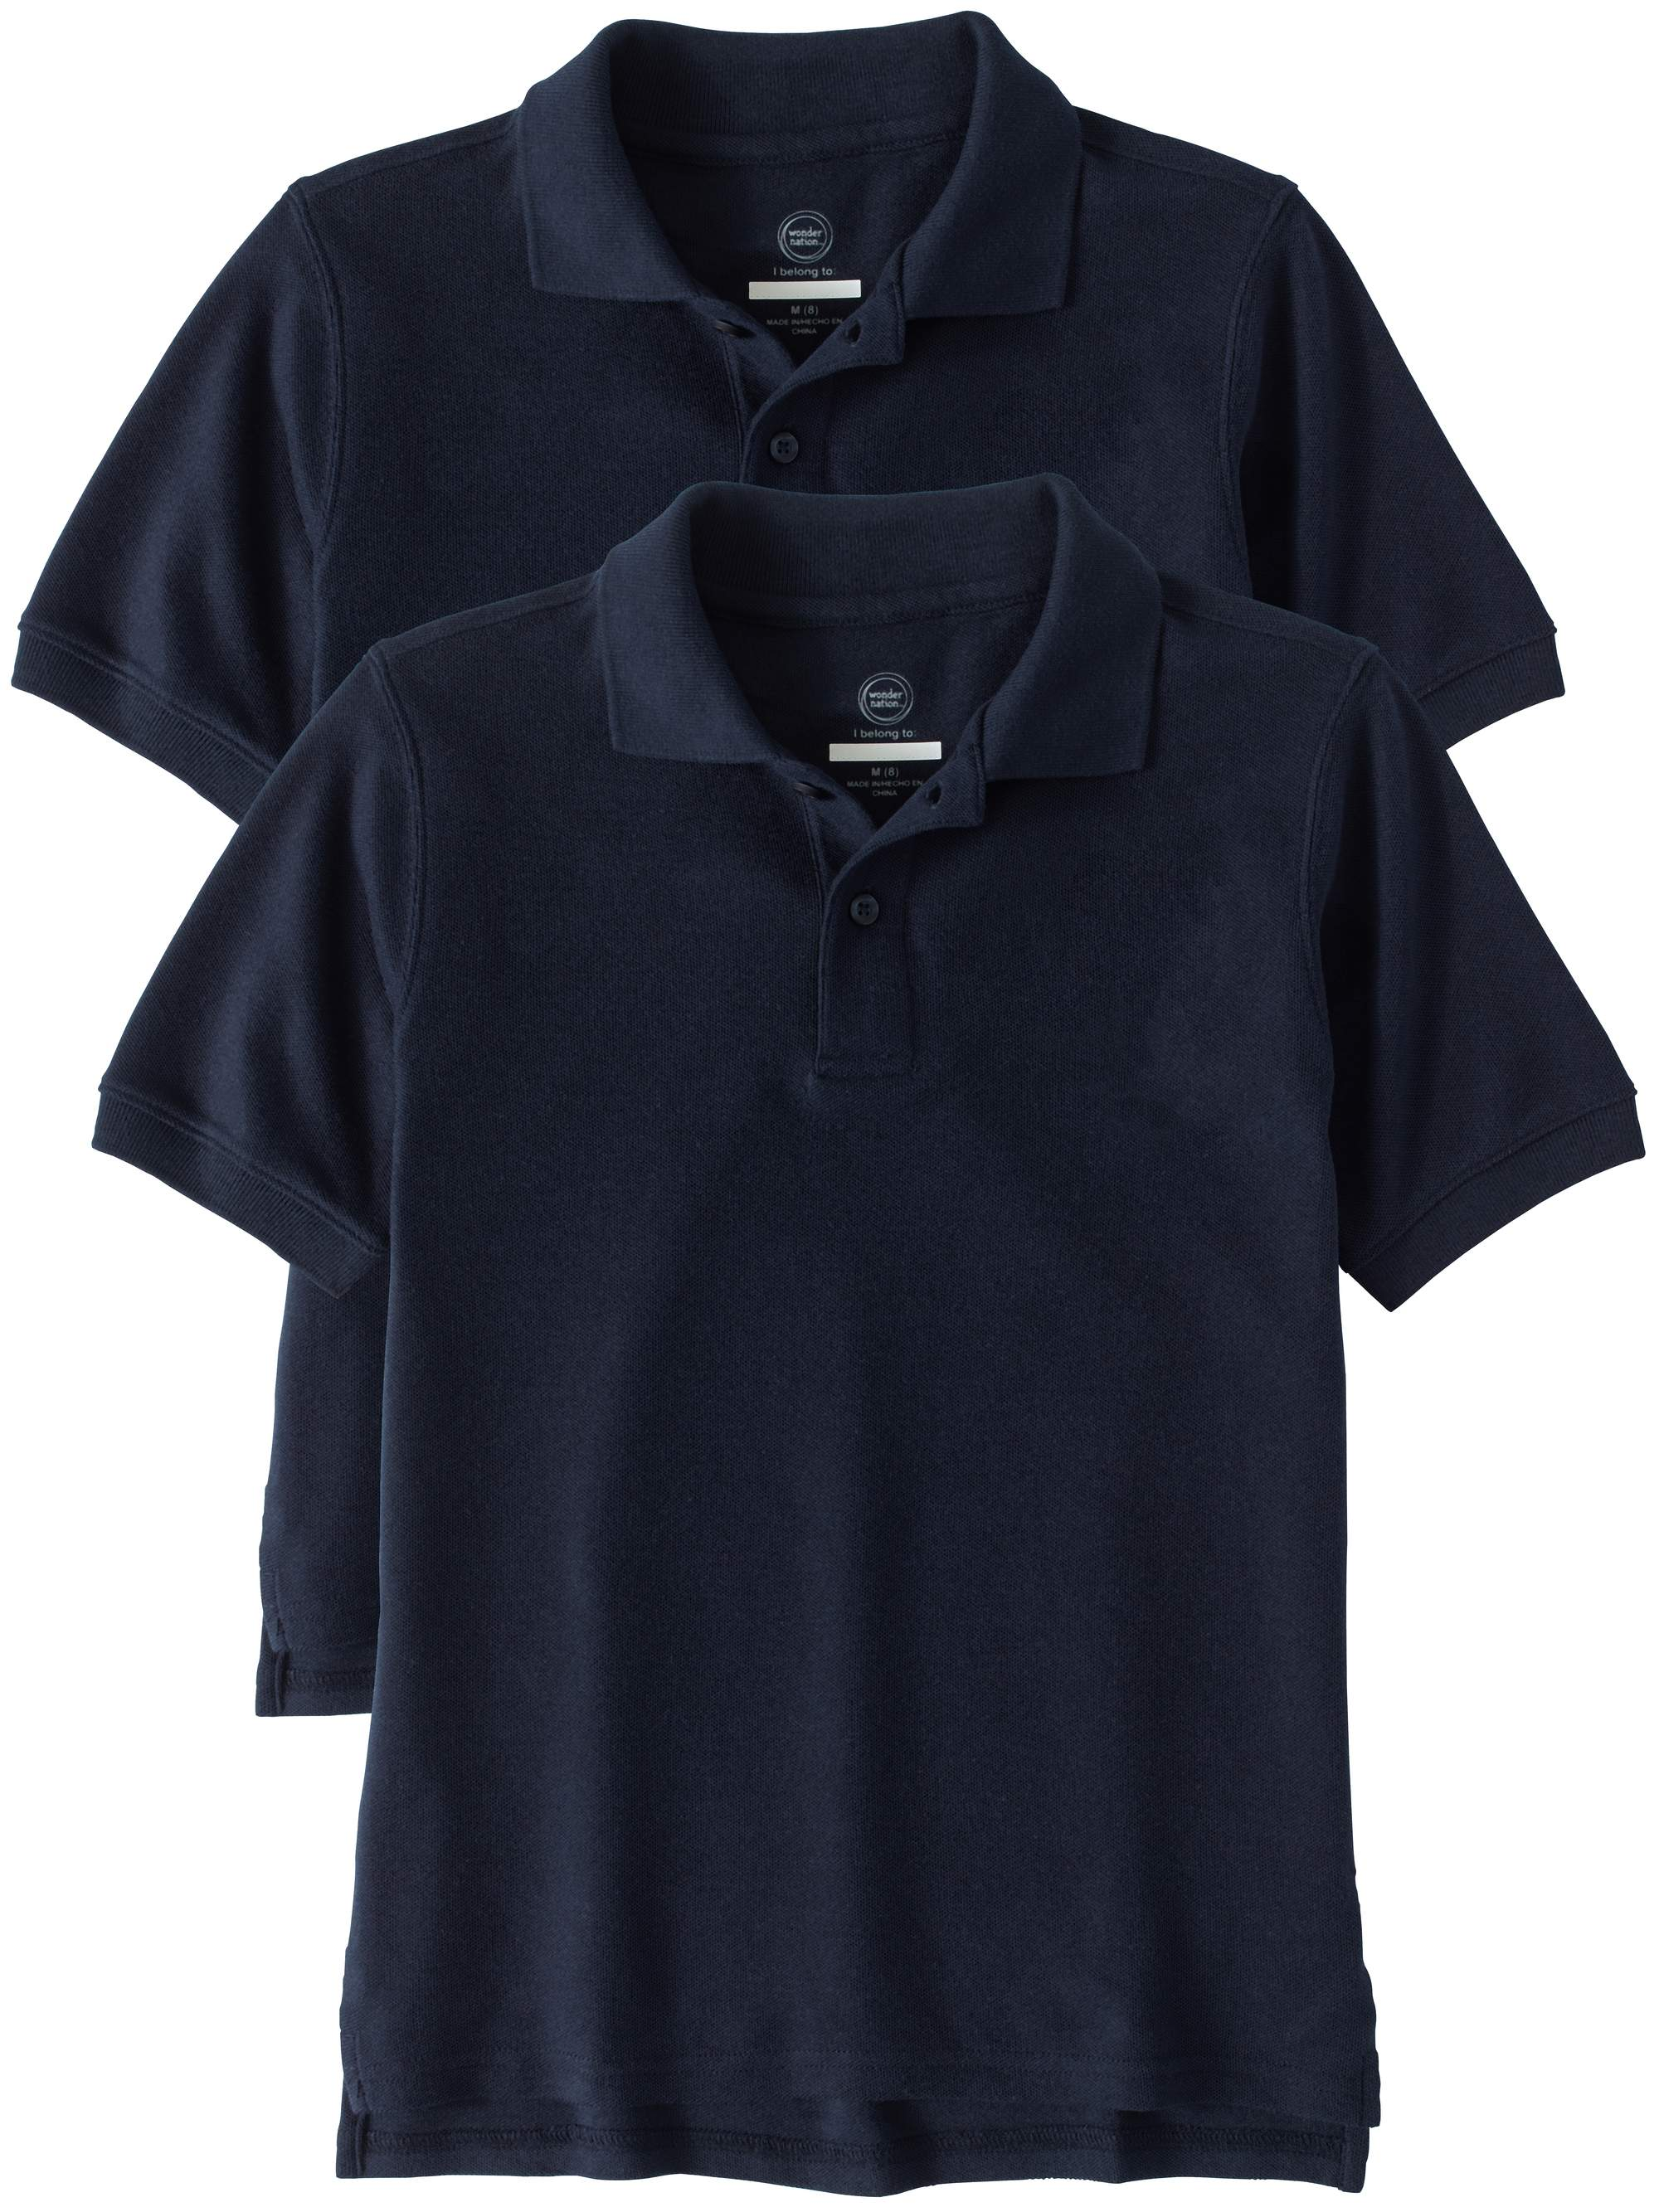 Boys Husky School Uniform Short Sleeve Double Pique Polo, 2-Pack Value Bundle